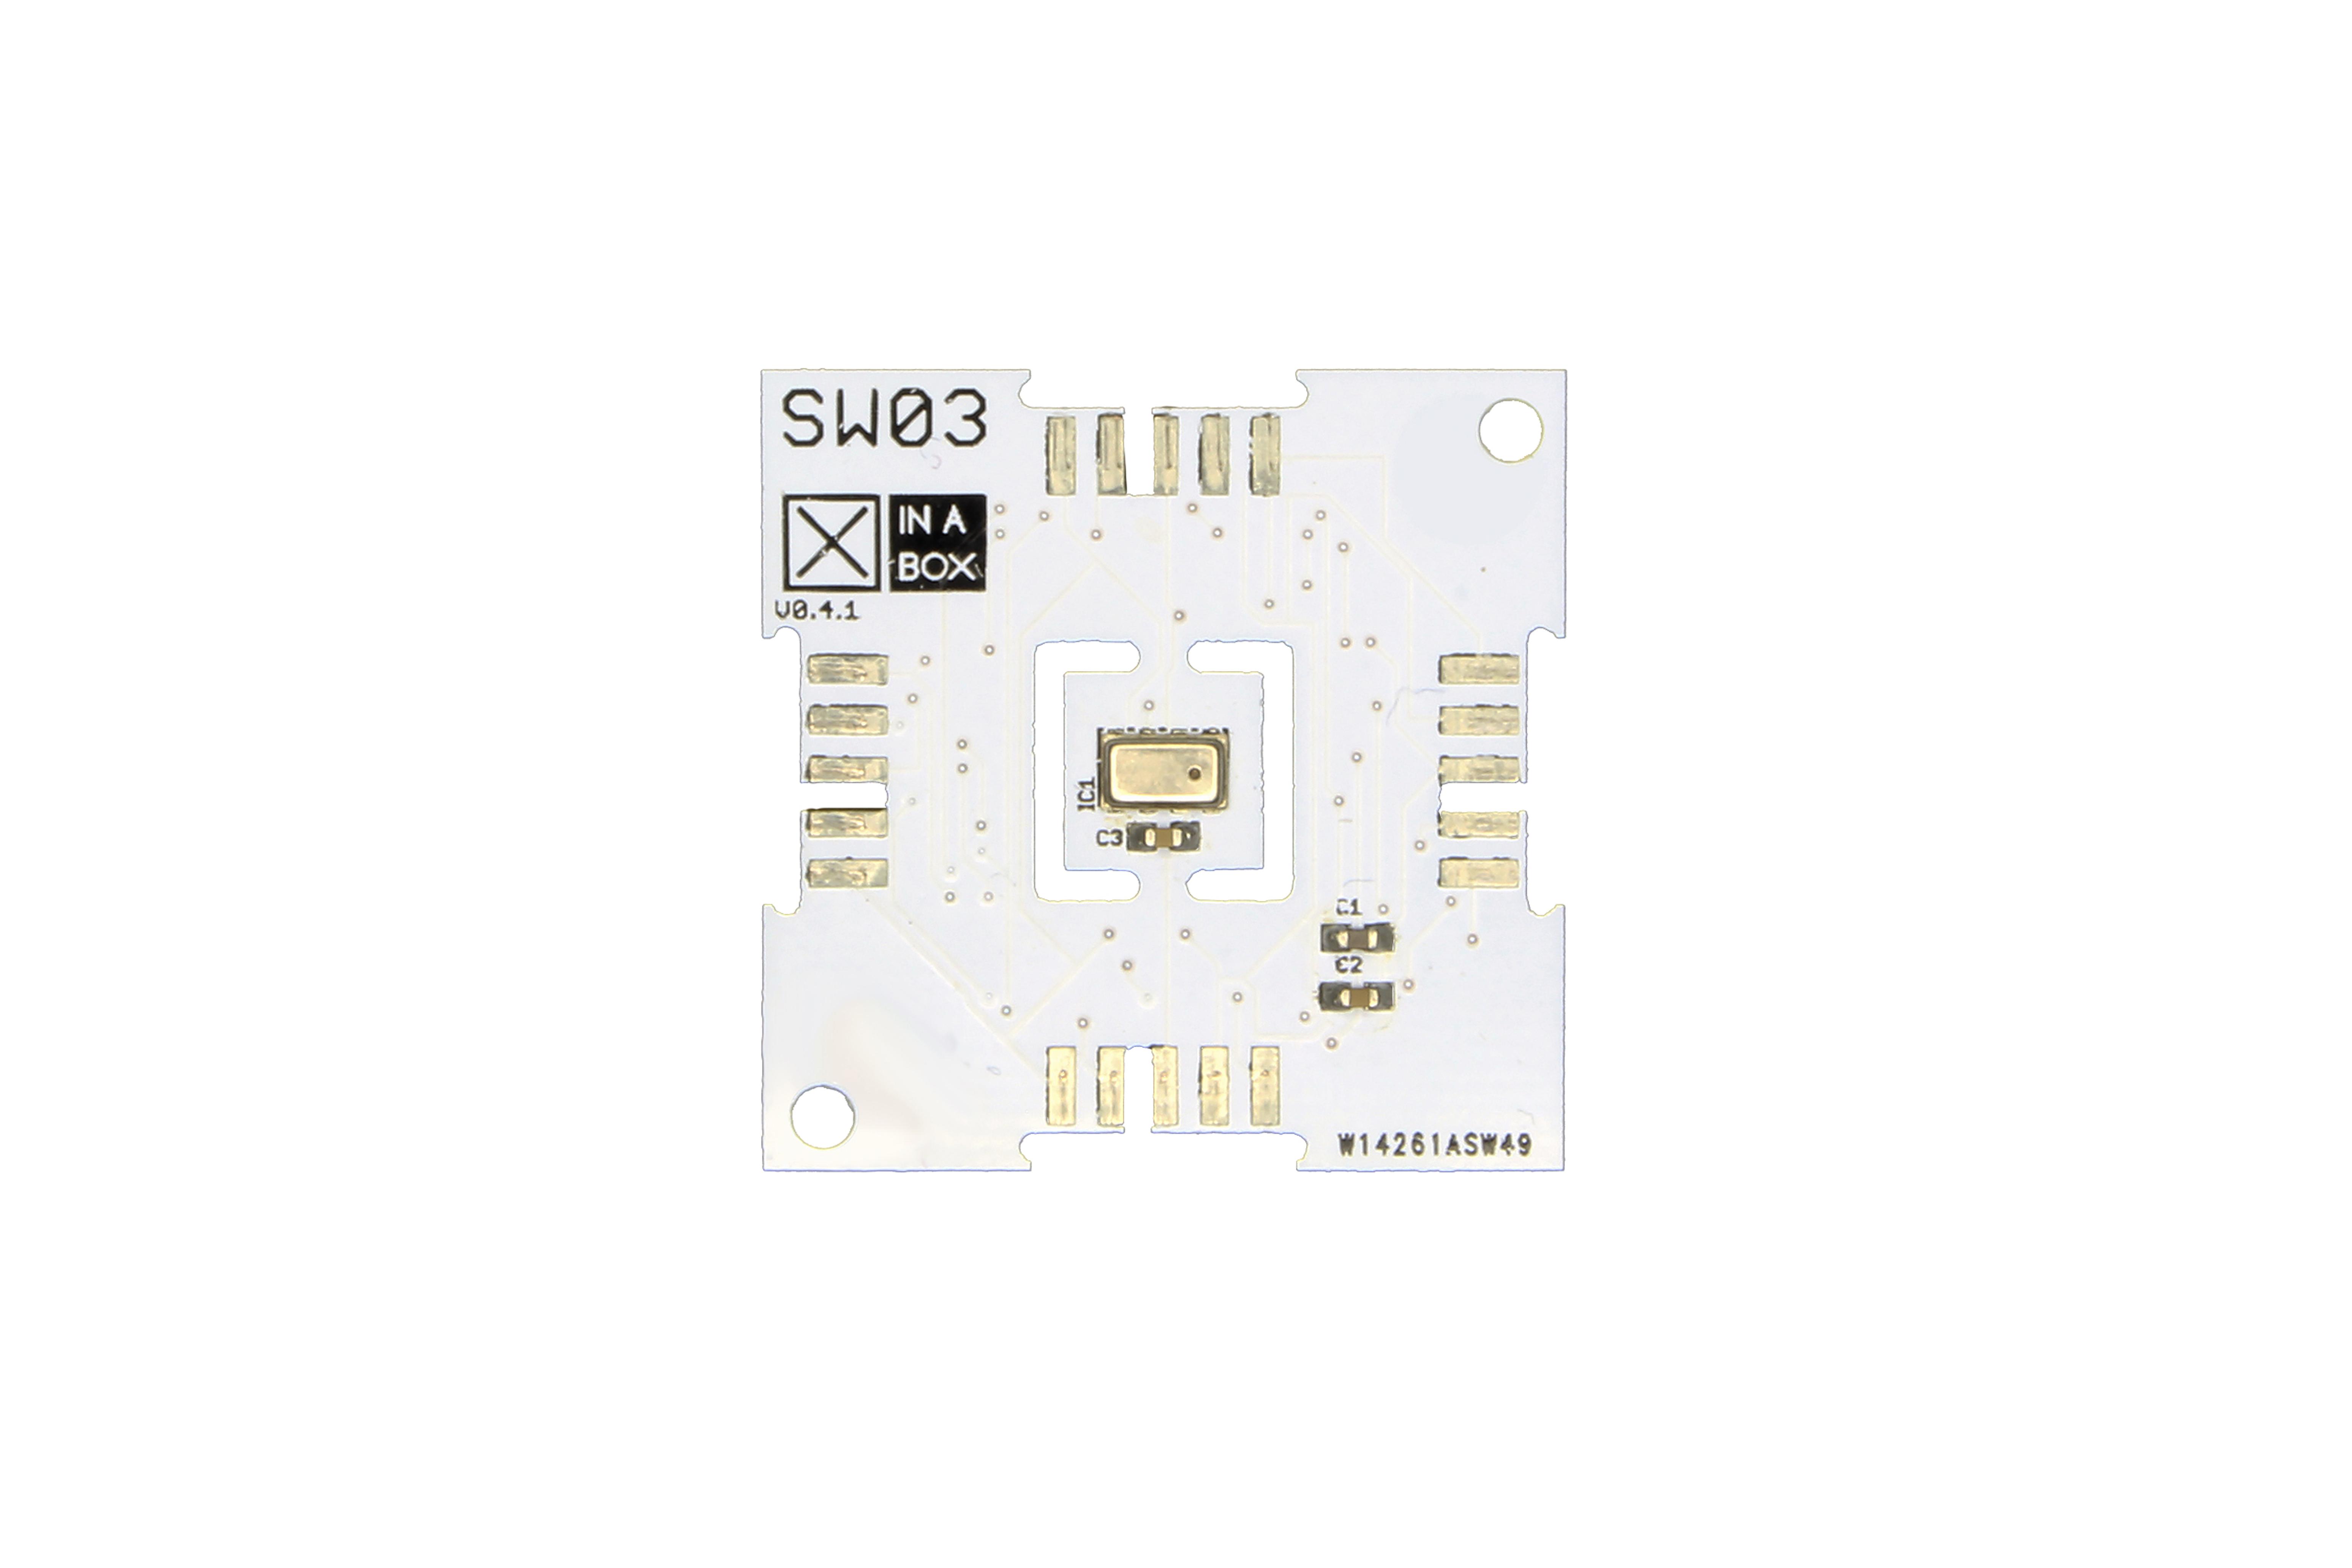 XinaBox SW03, modulo sensore meteo per MPL3115A2